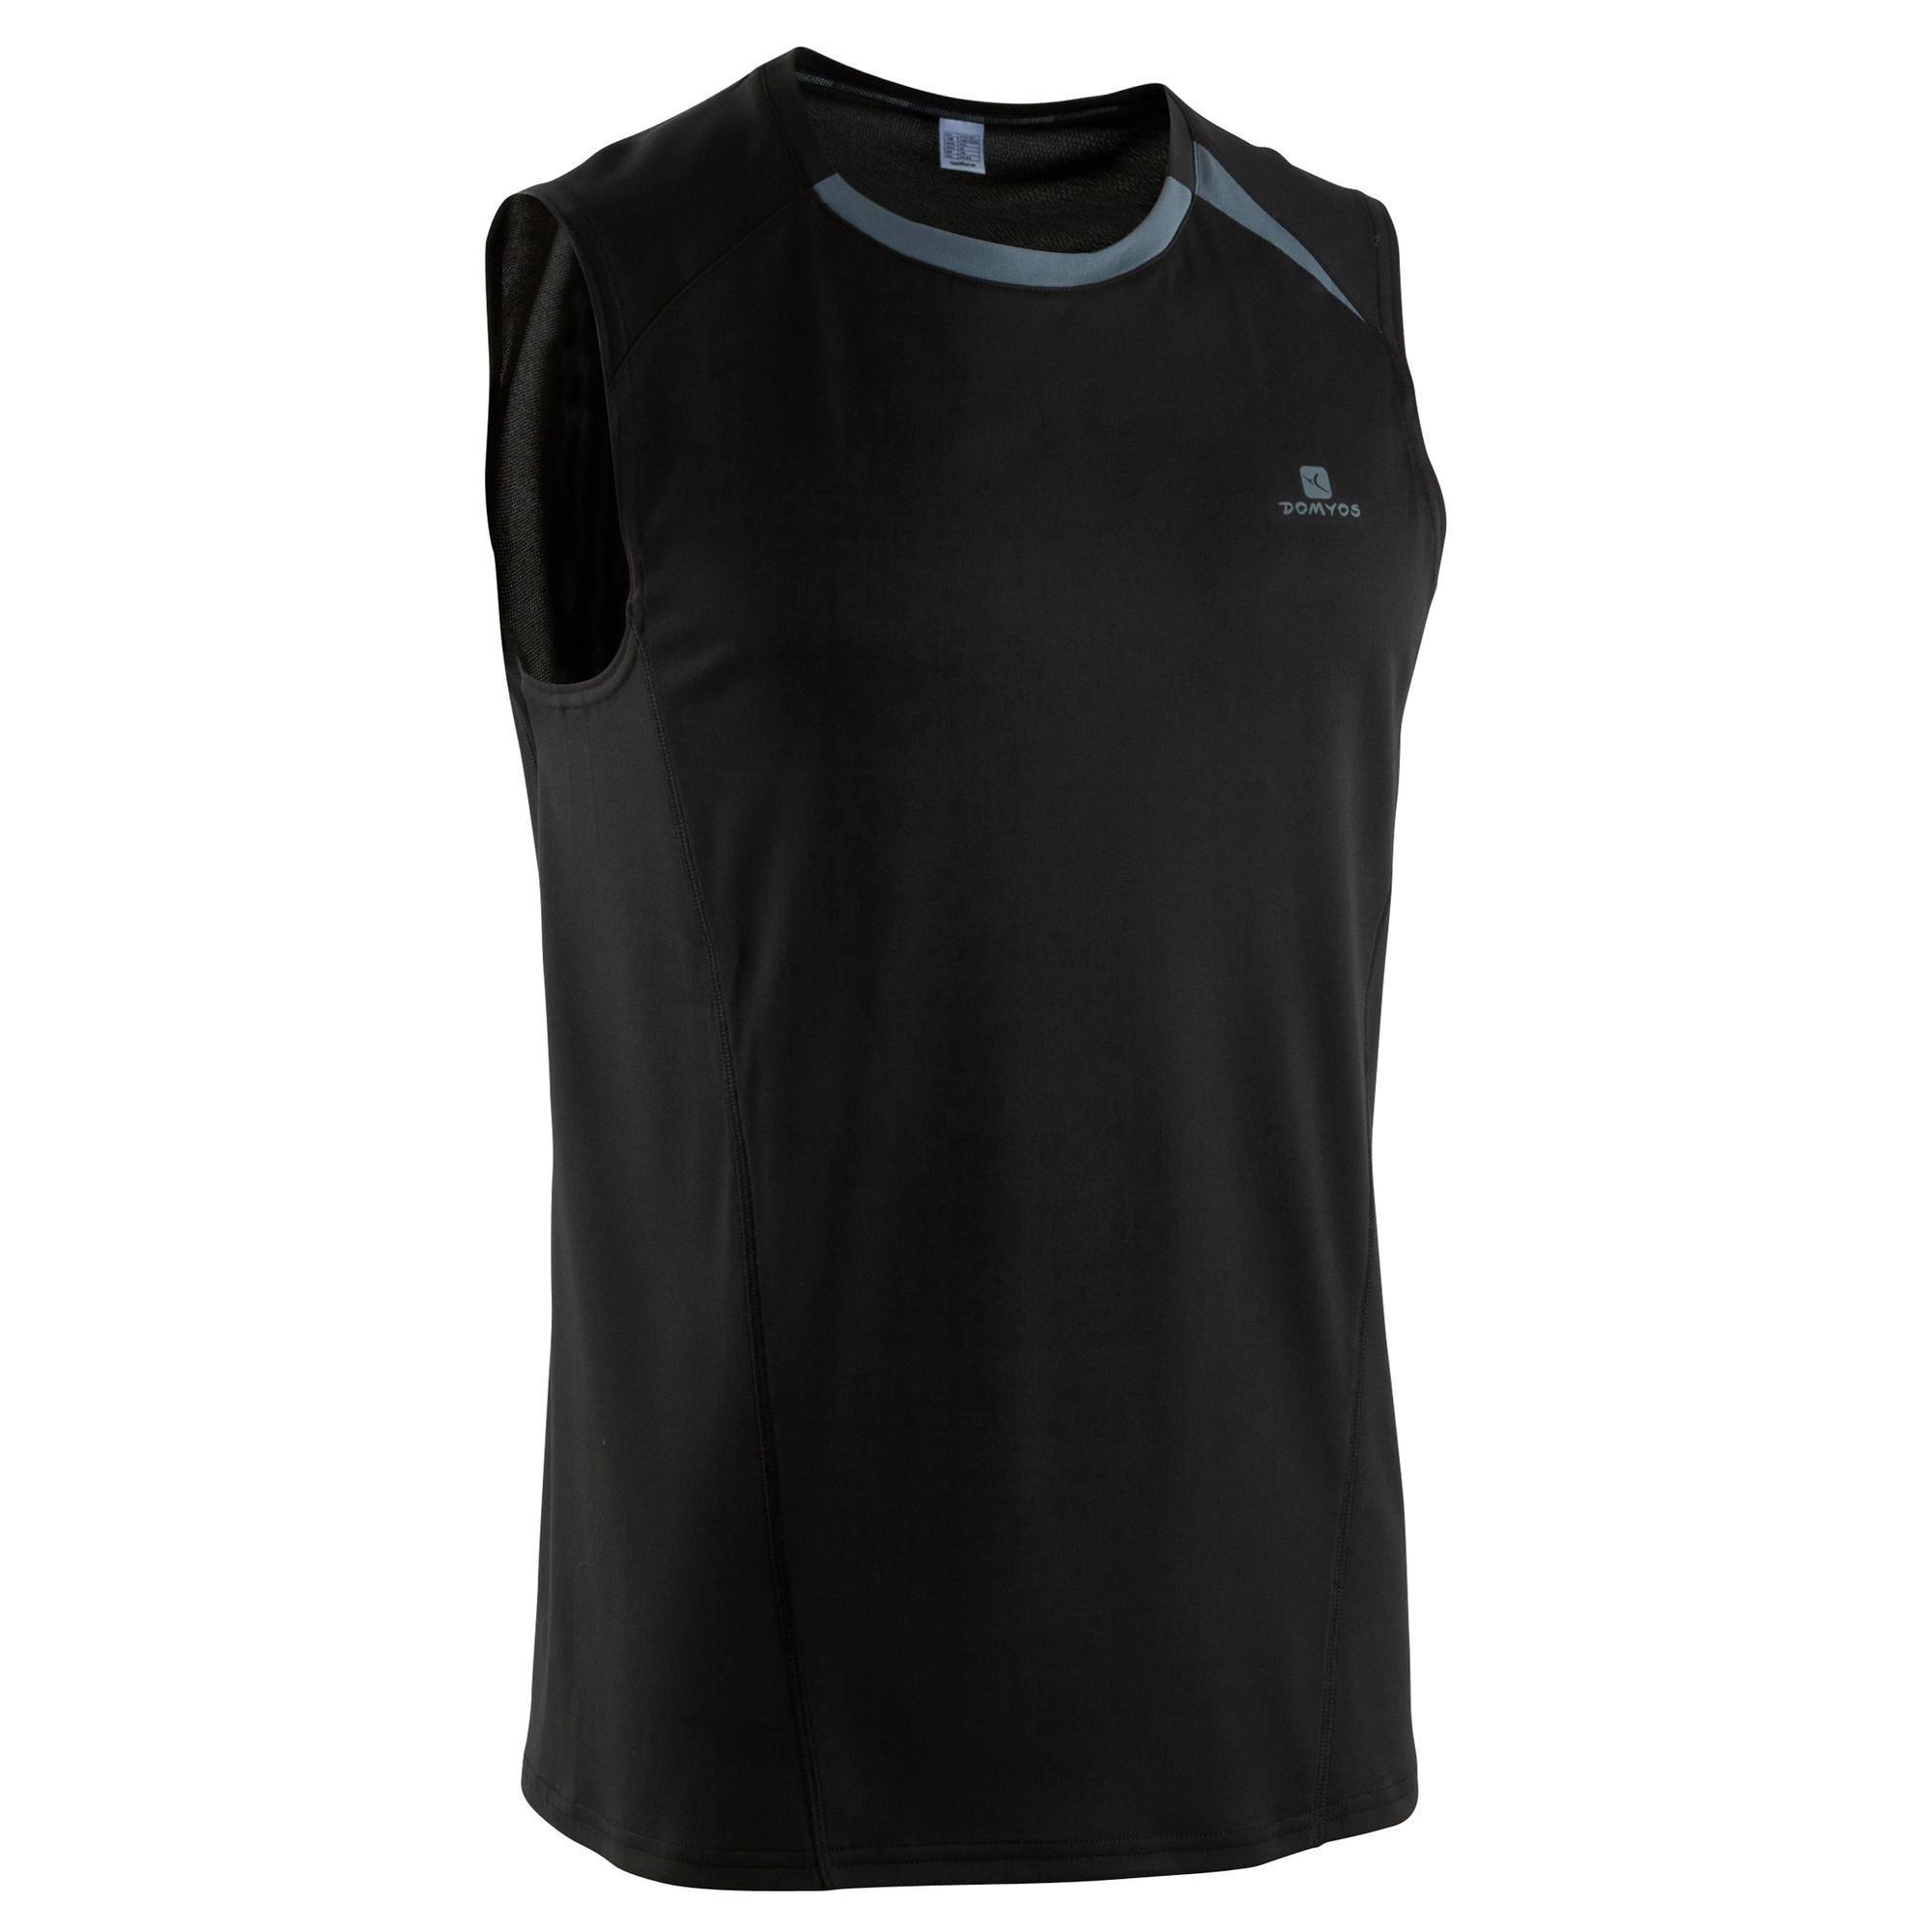 Vêtements fitness cardio-training homme  47c448402c0